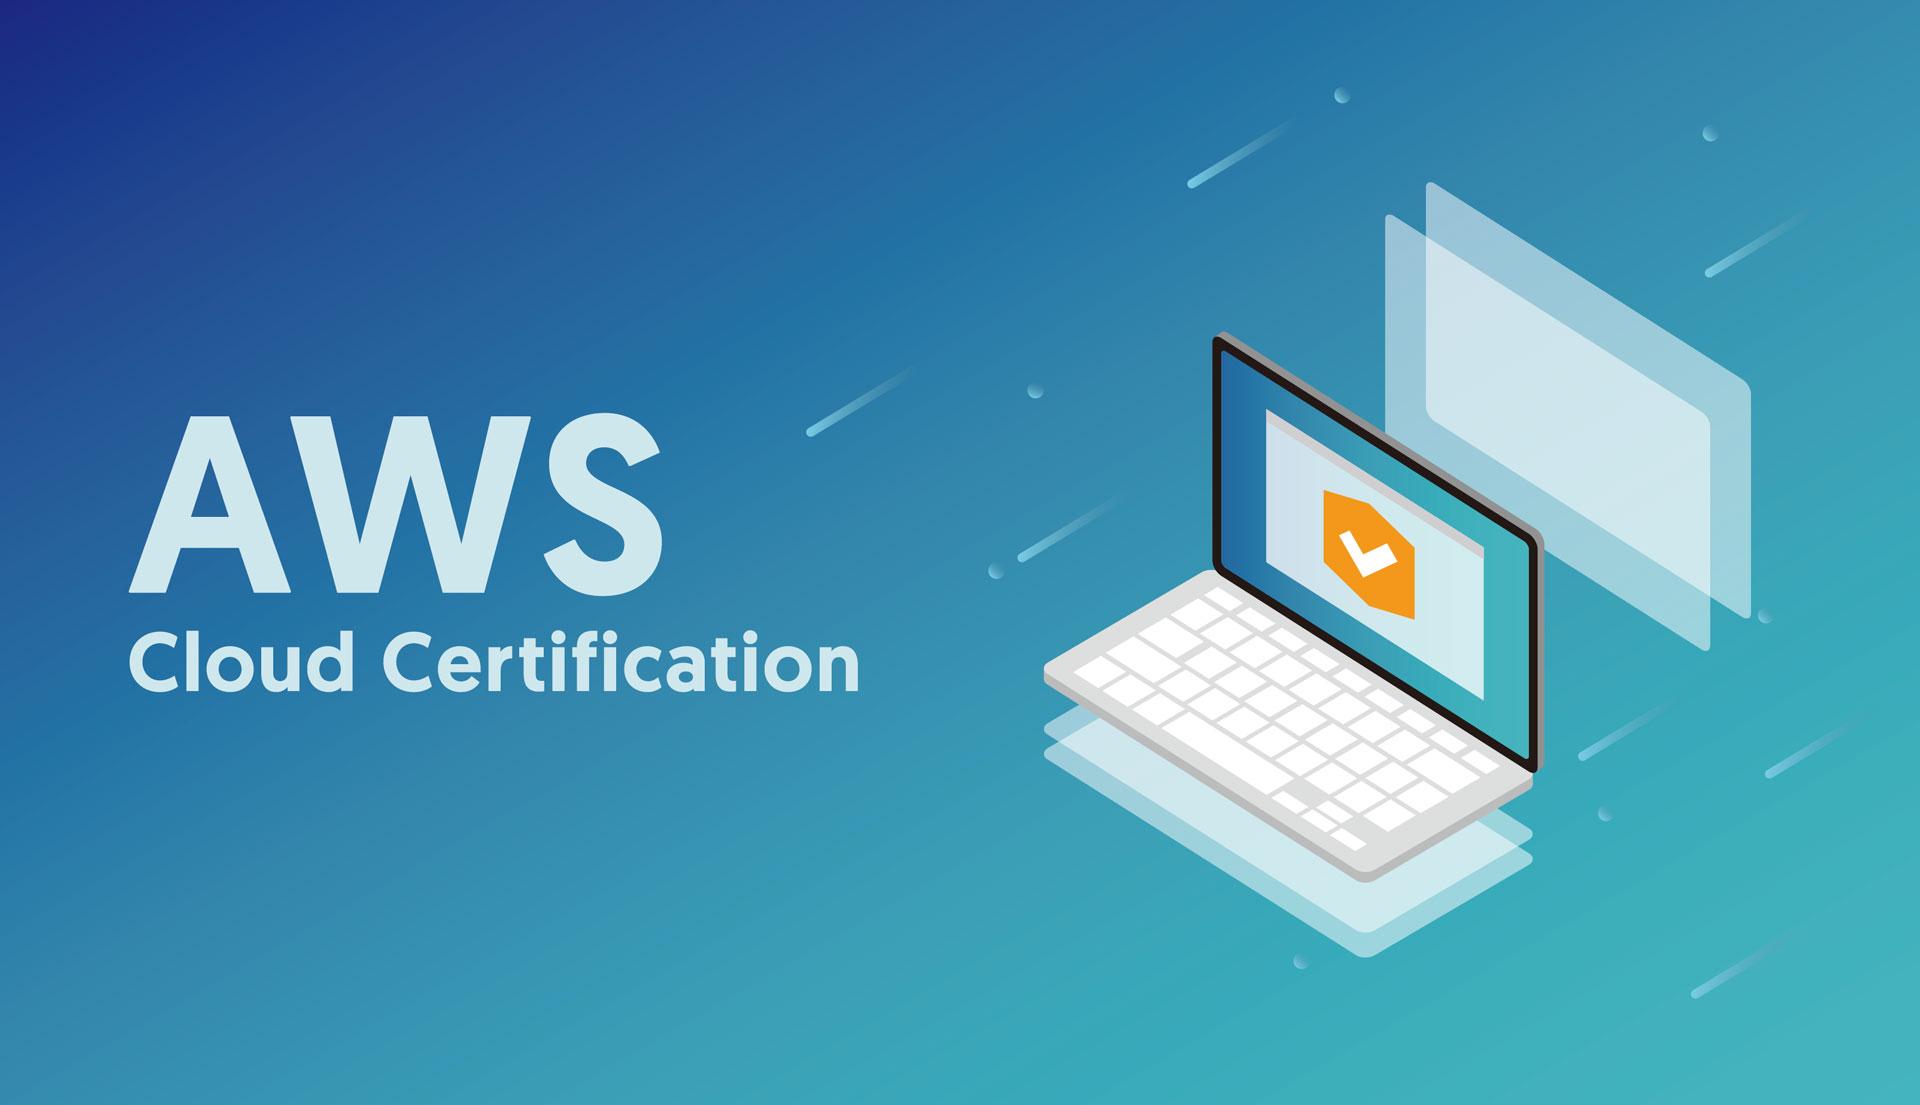 AWS Cloud Certification